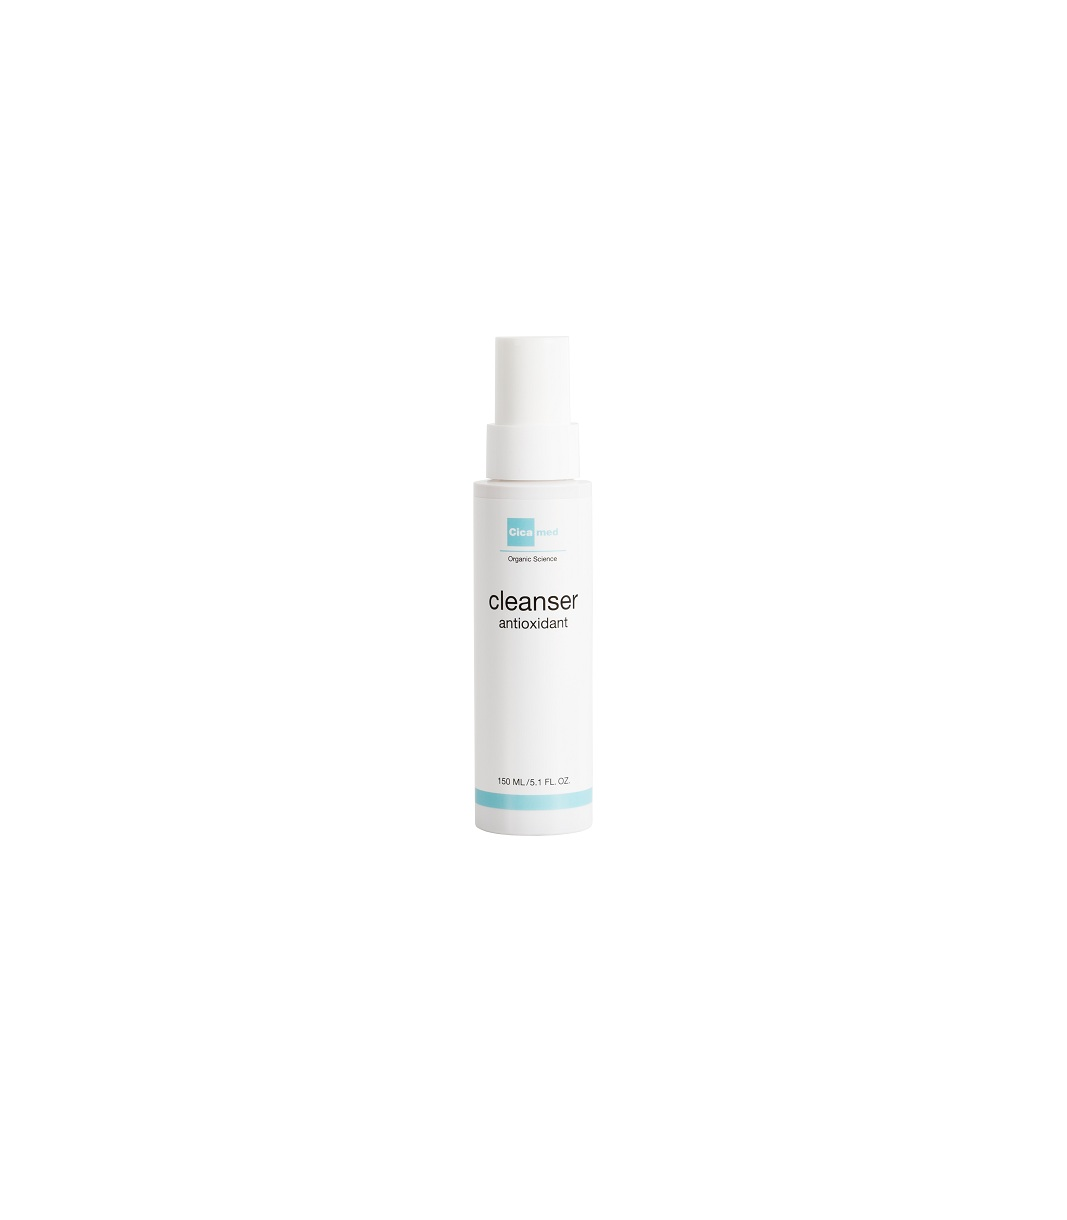 cleanser-antioxidant-limpiador-antioxidante---150-ml.jpg